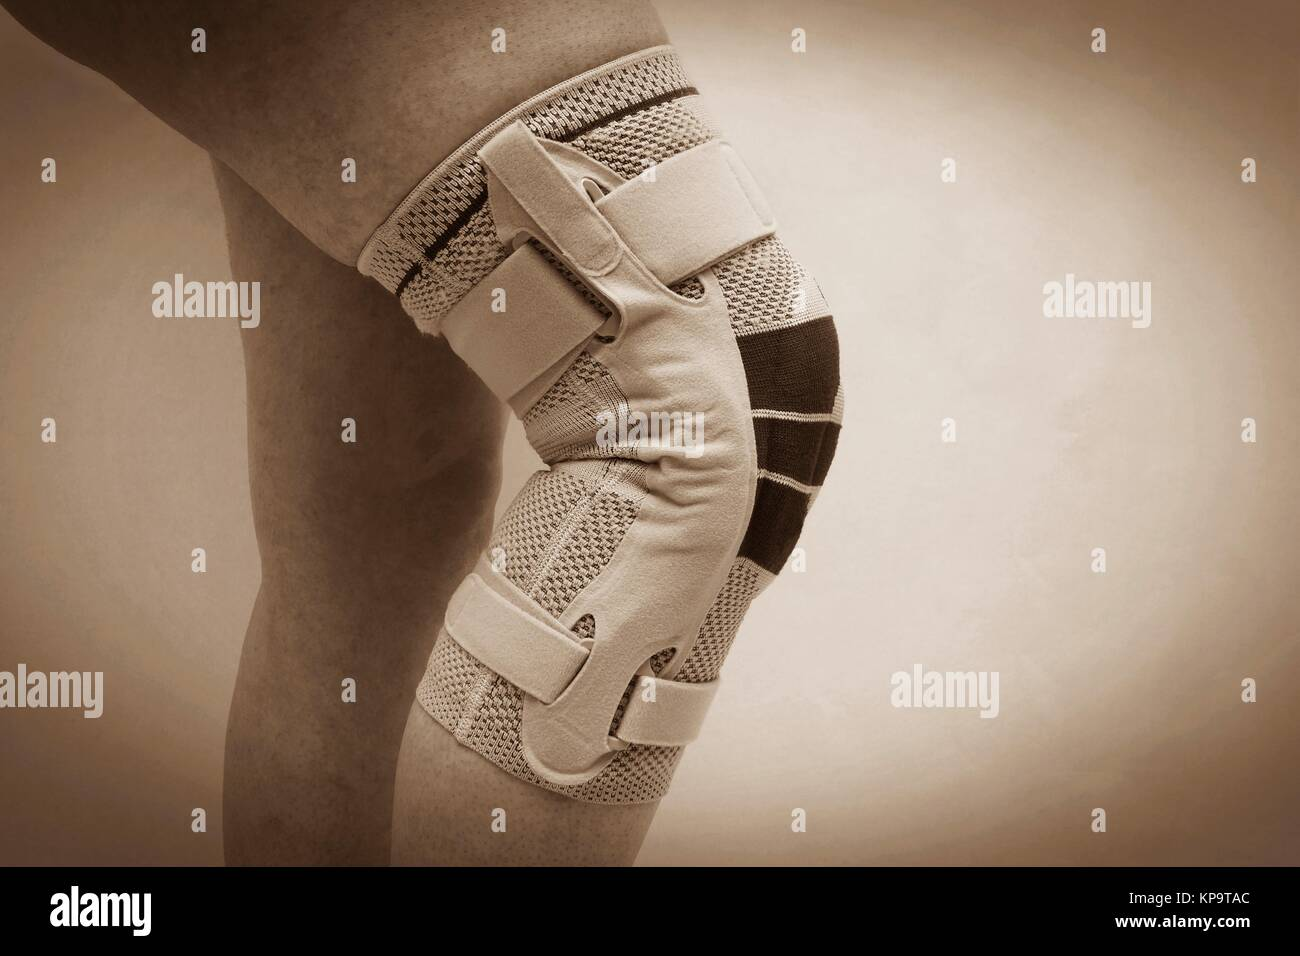 knee brace on a woman's leg Stock Photo